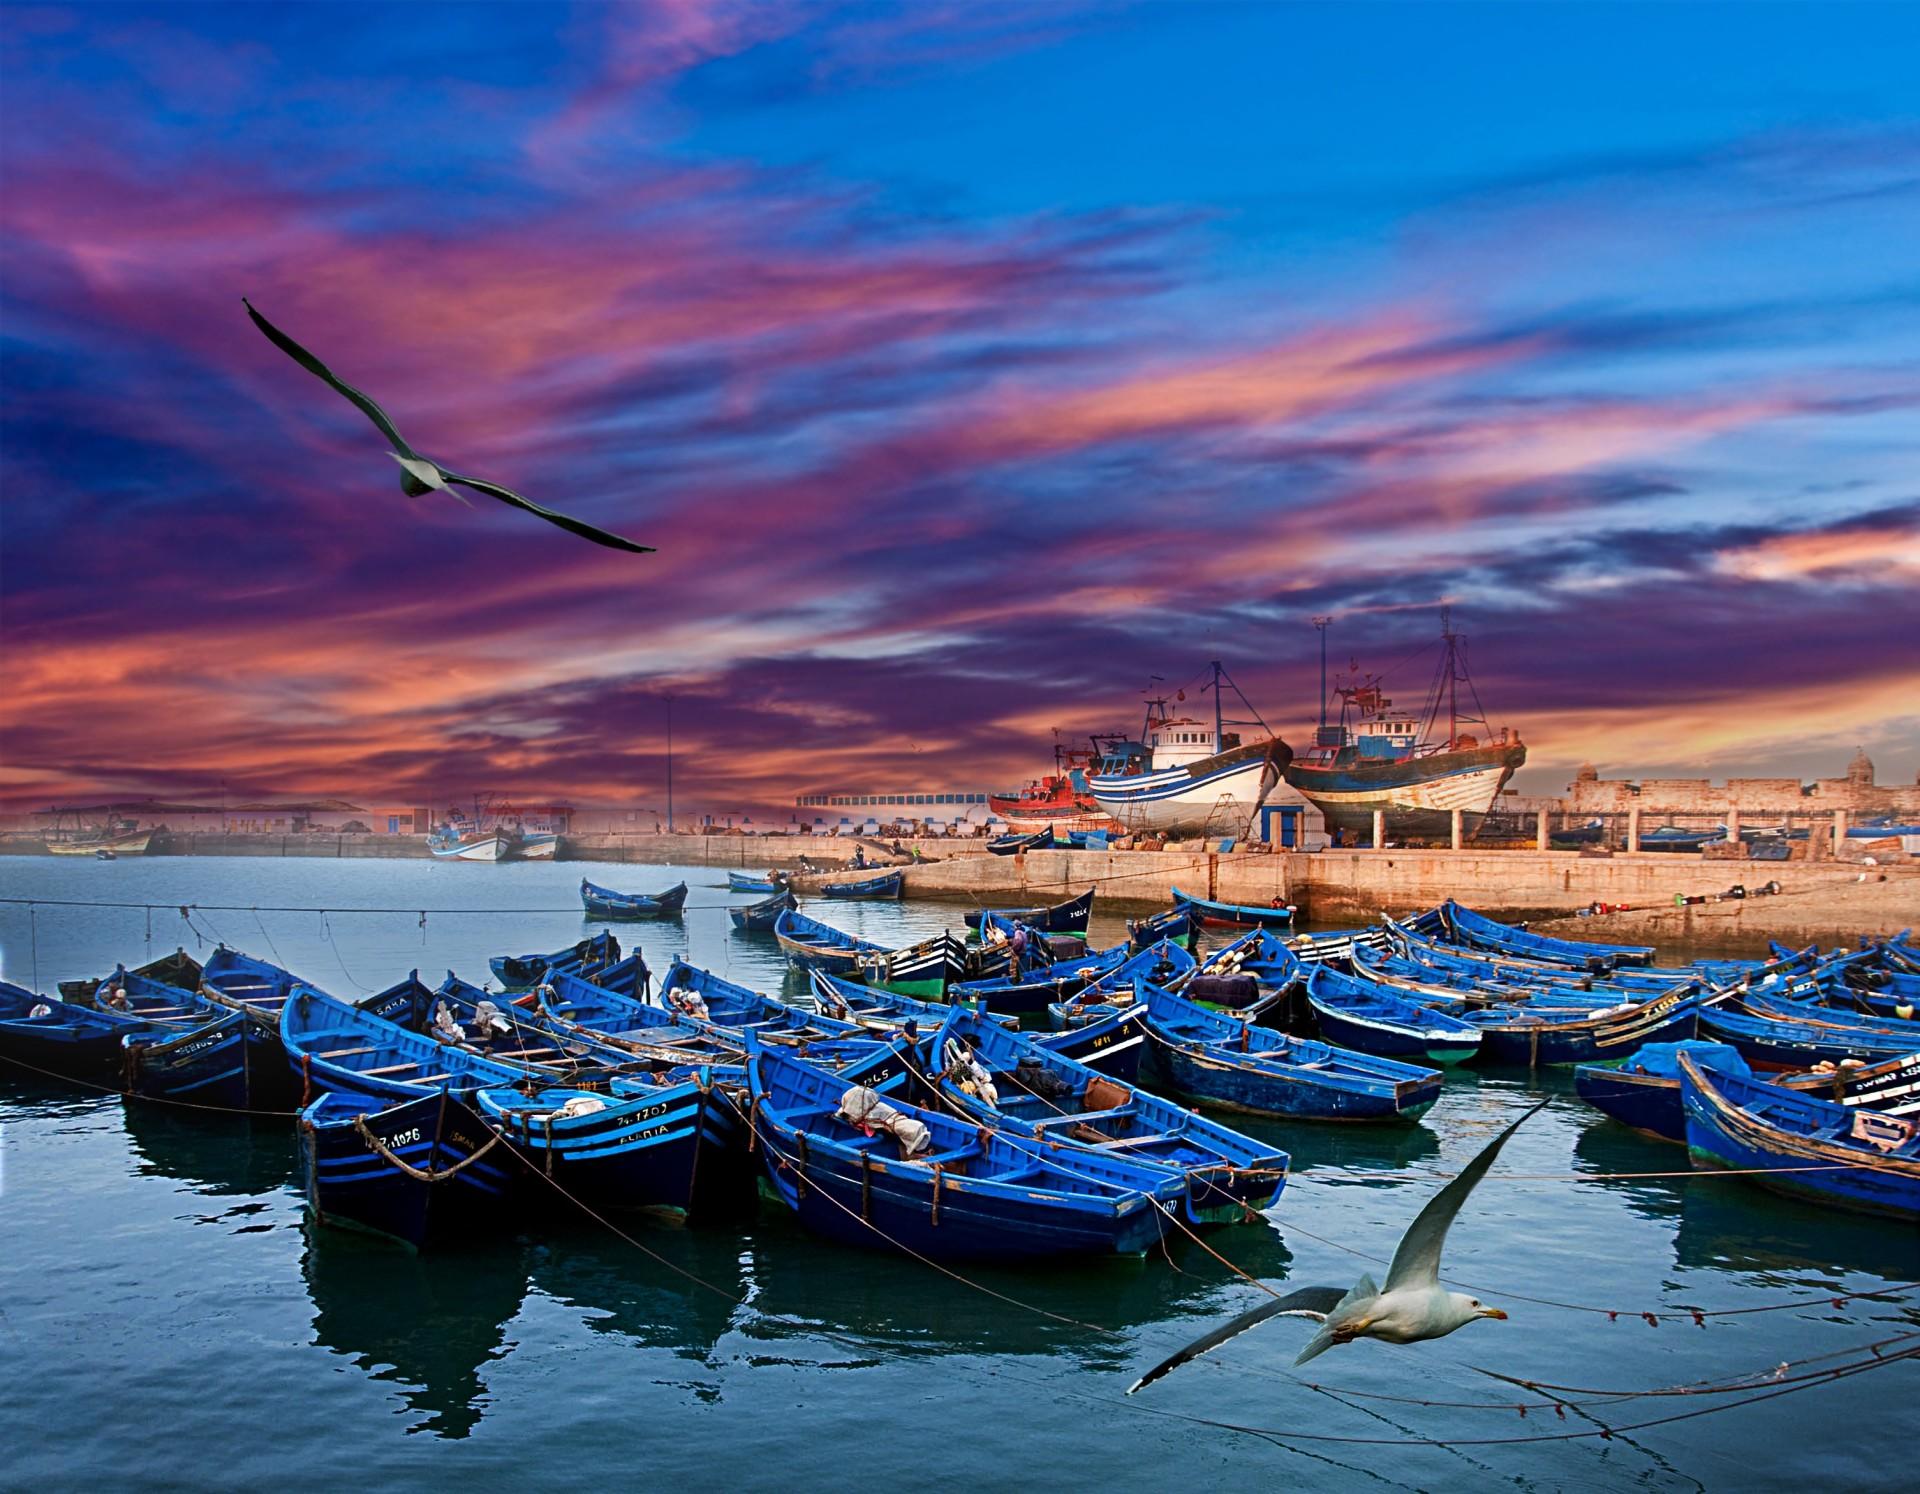 Blauwe Vissersboten met rondvliegende meeuwen erboven, Essaouira, Marokko